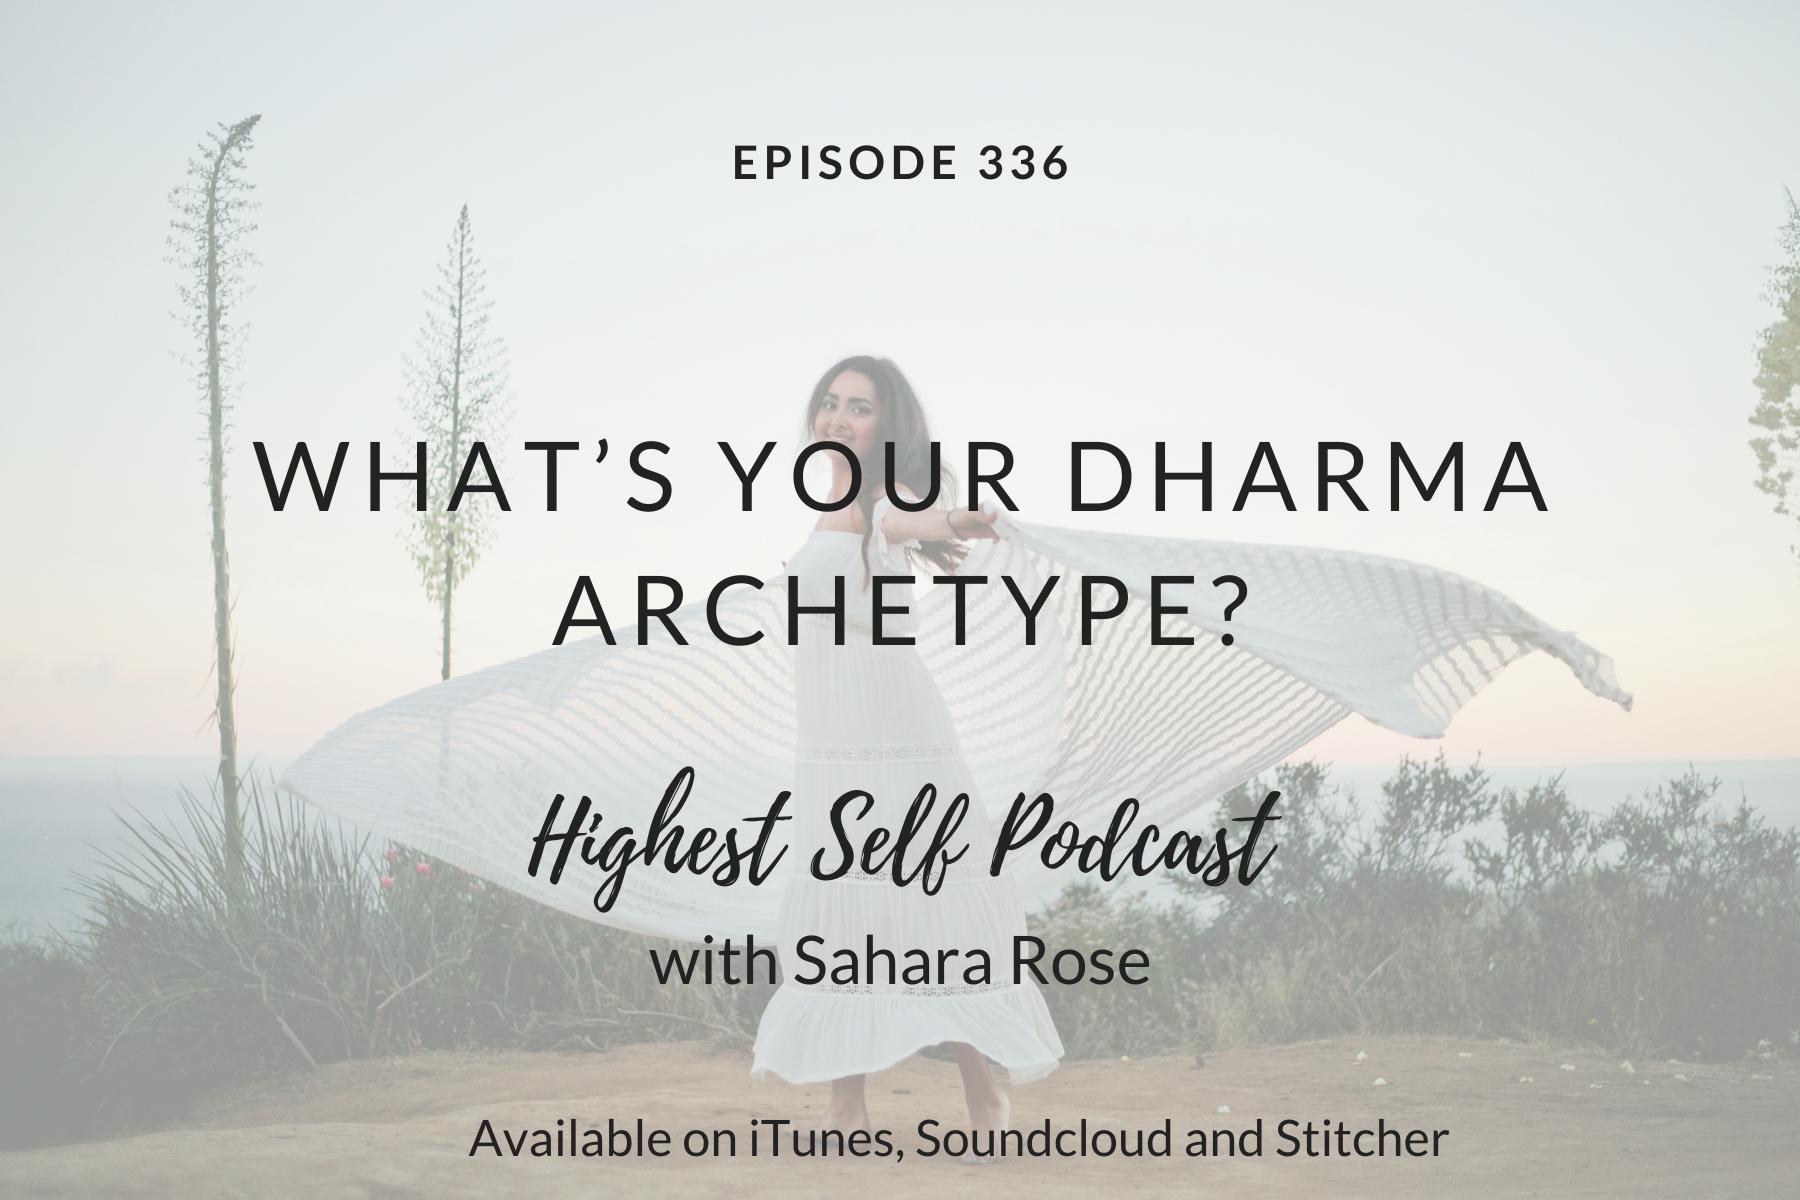 your dharma archetype